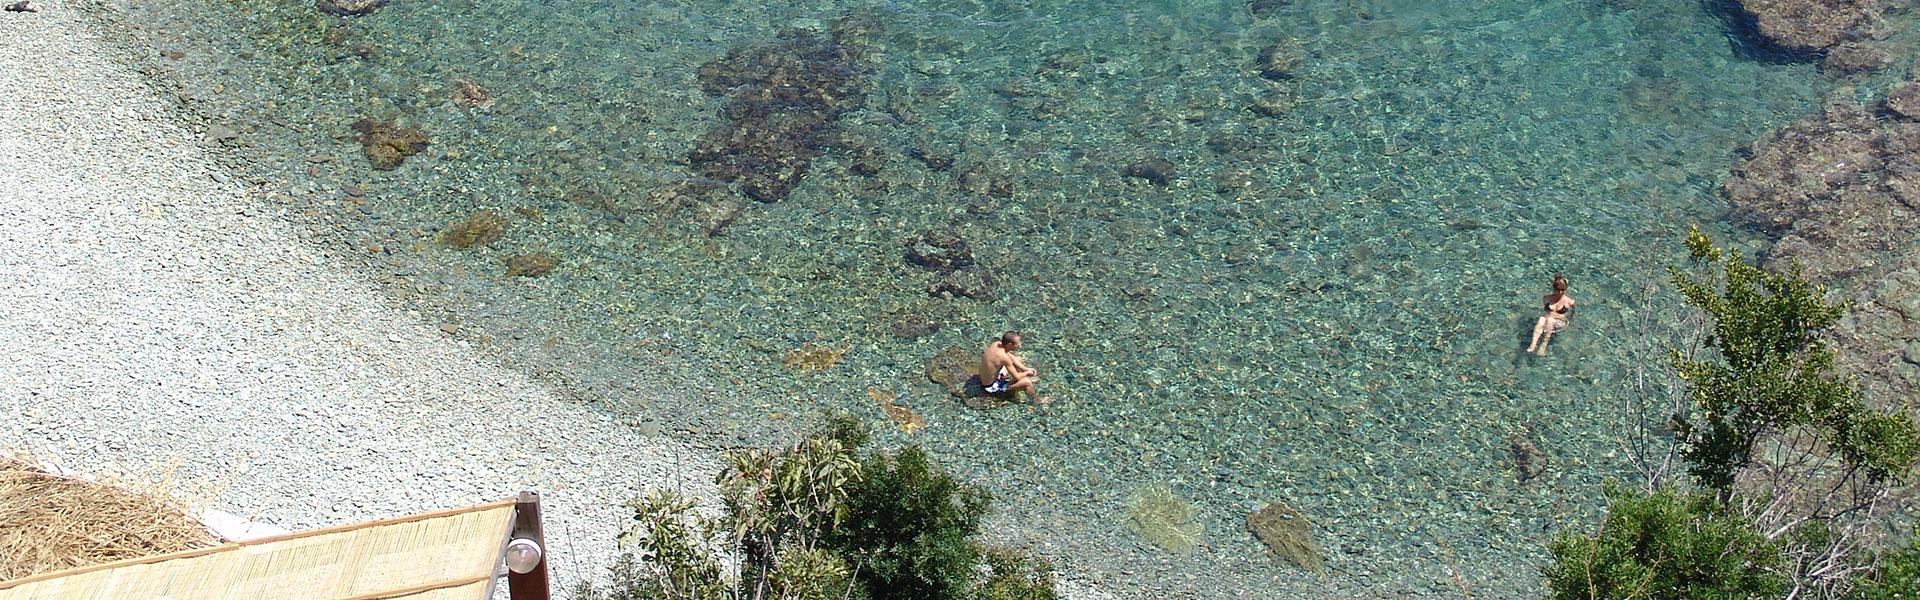 plage-pietranera13487